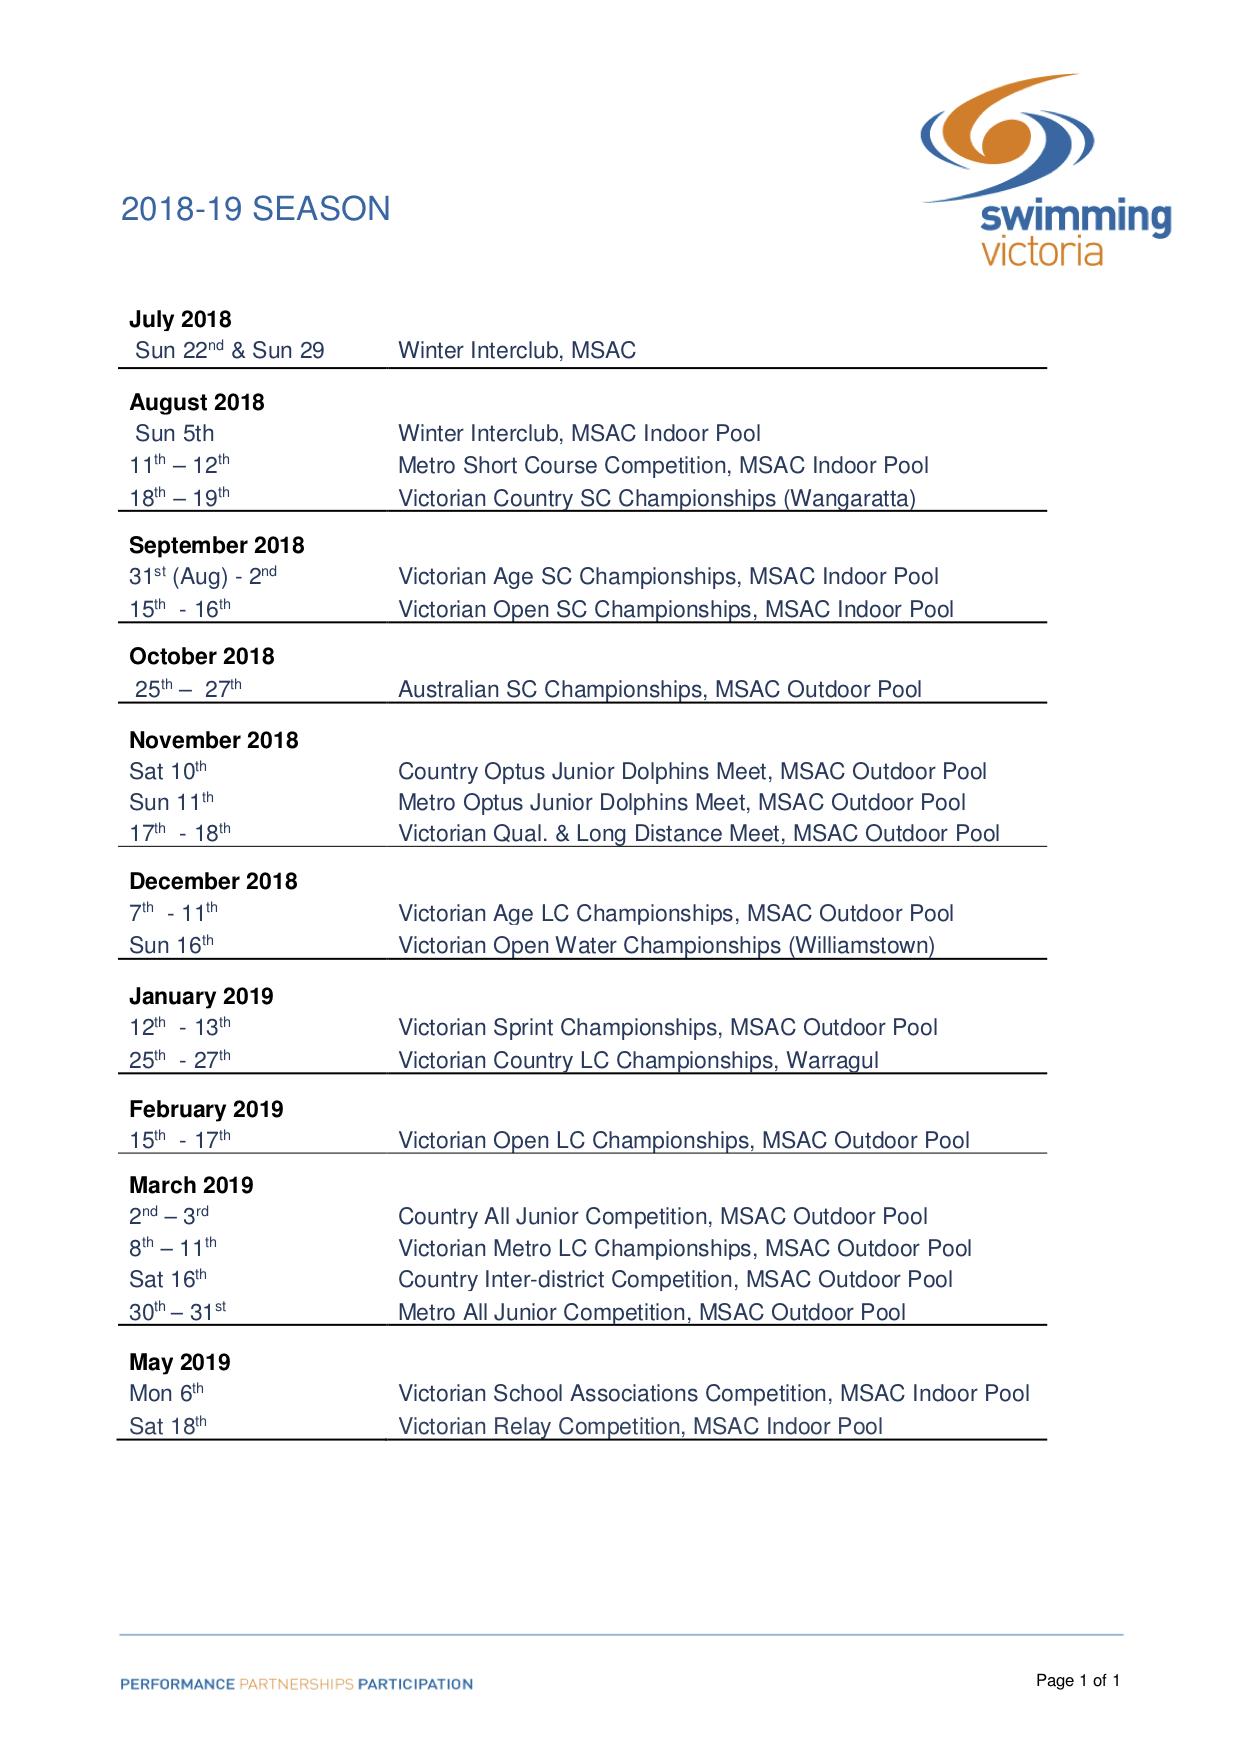 SwVic Confirmed 18-19 Calendar pg1.jpg